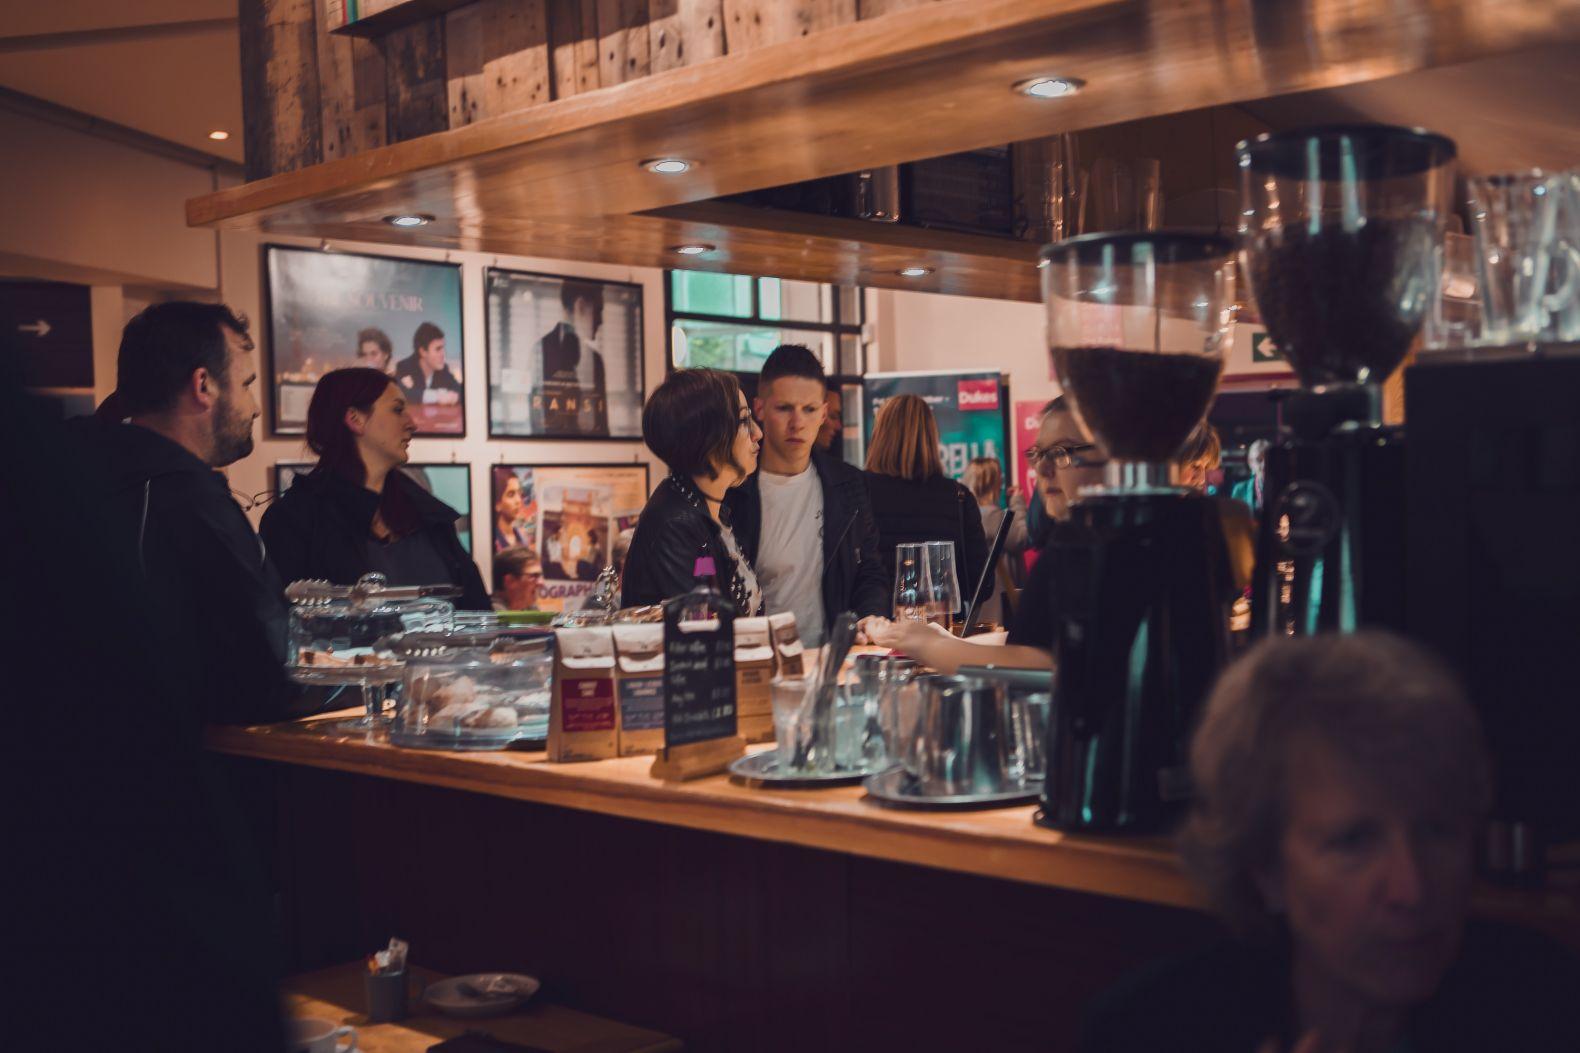 The Dukes cafebar